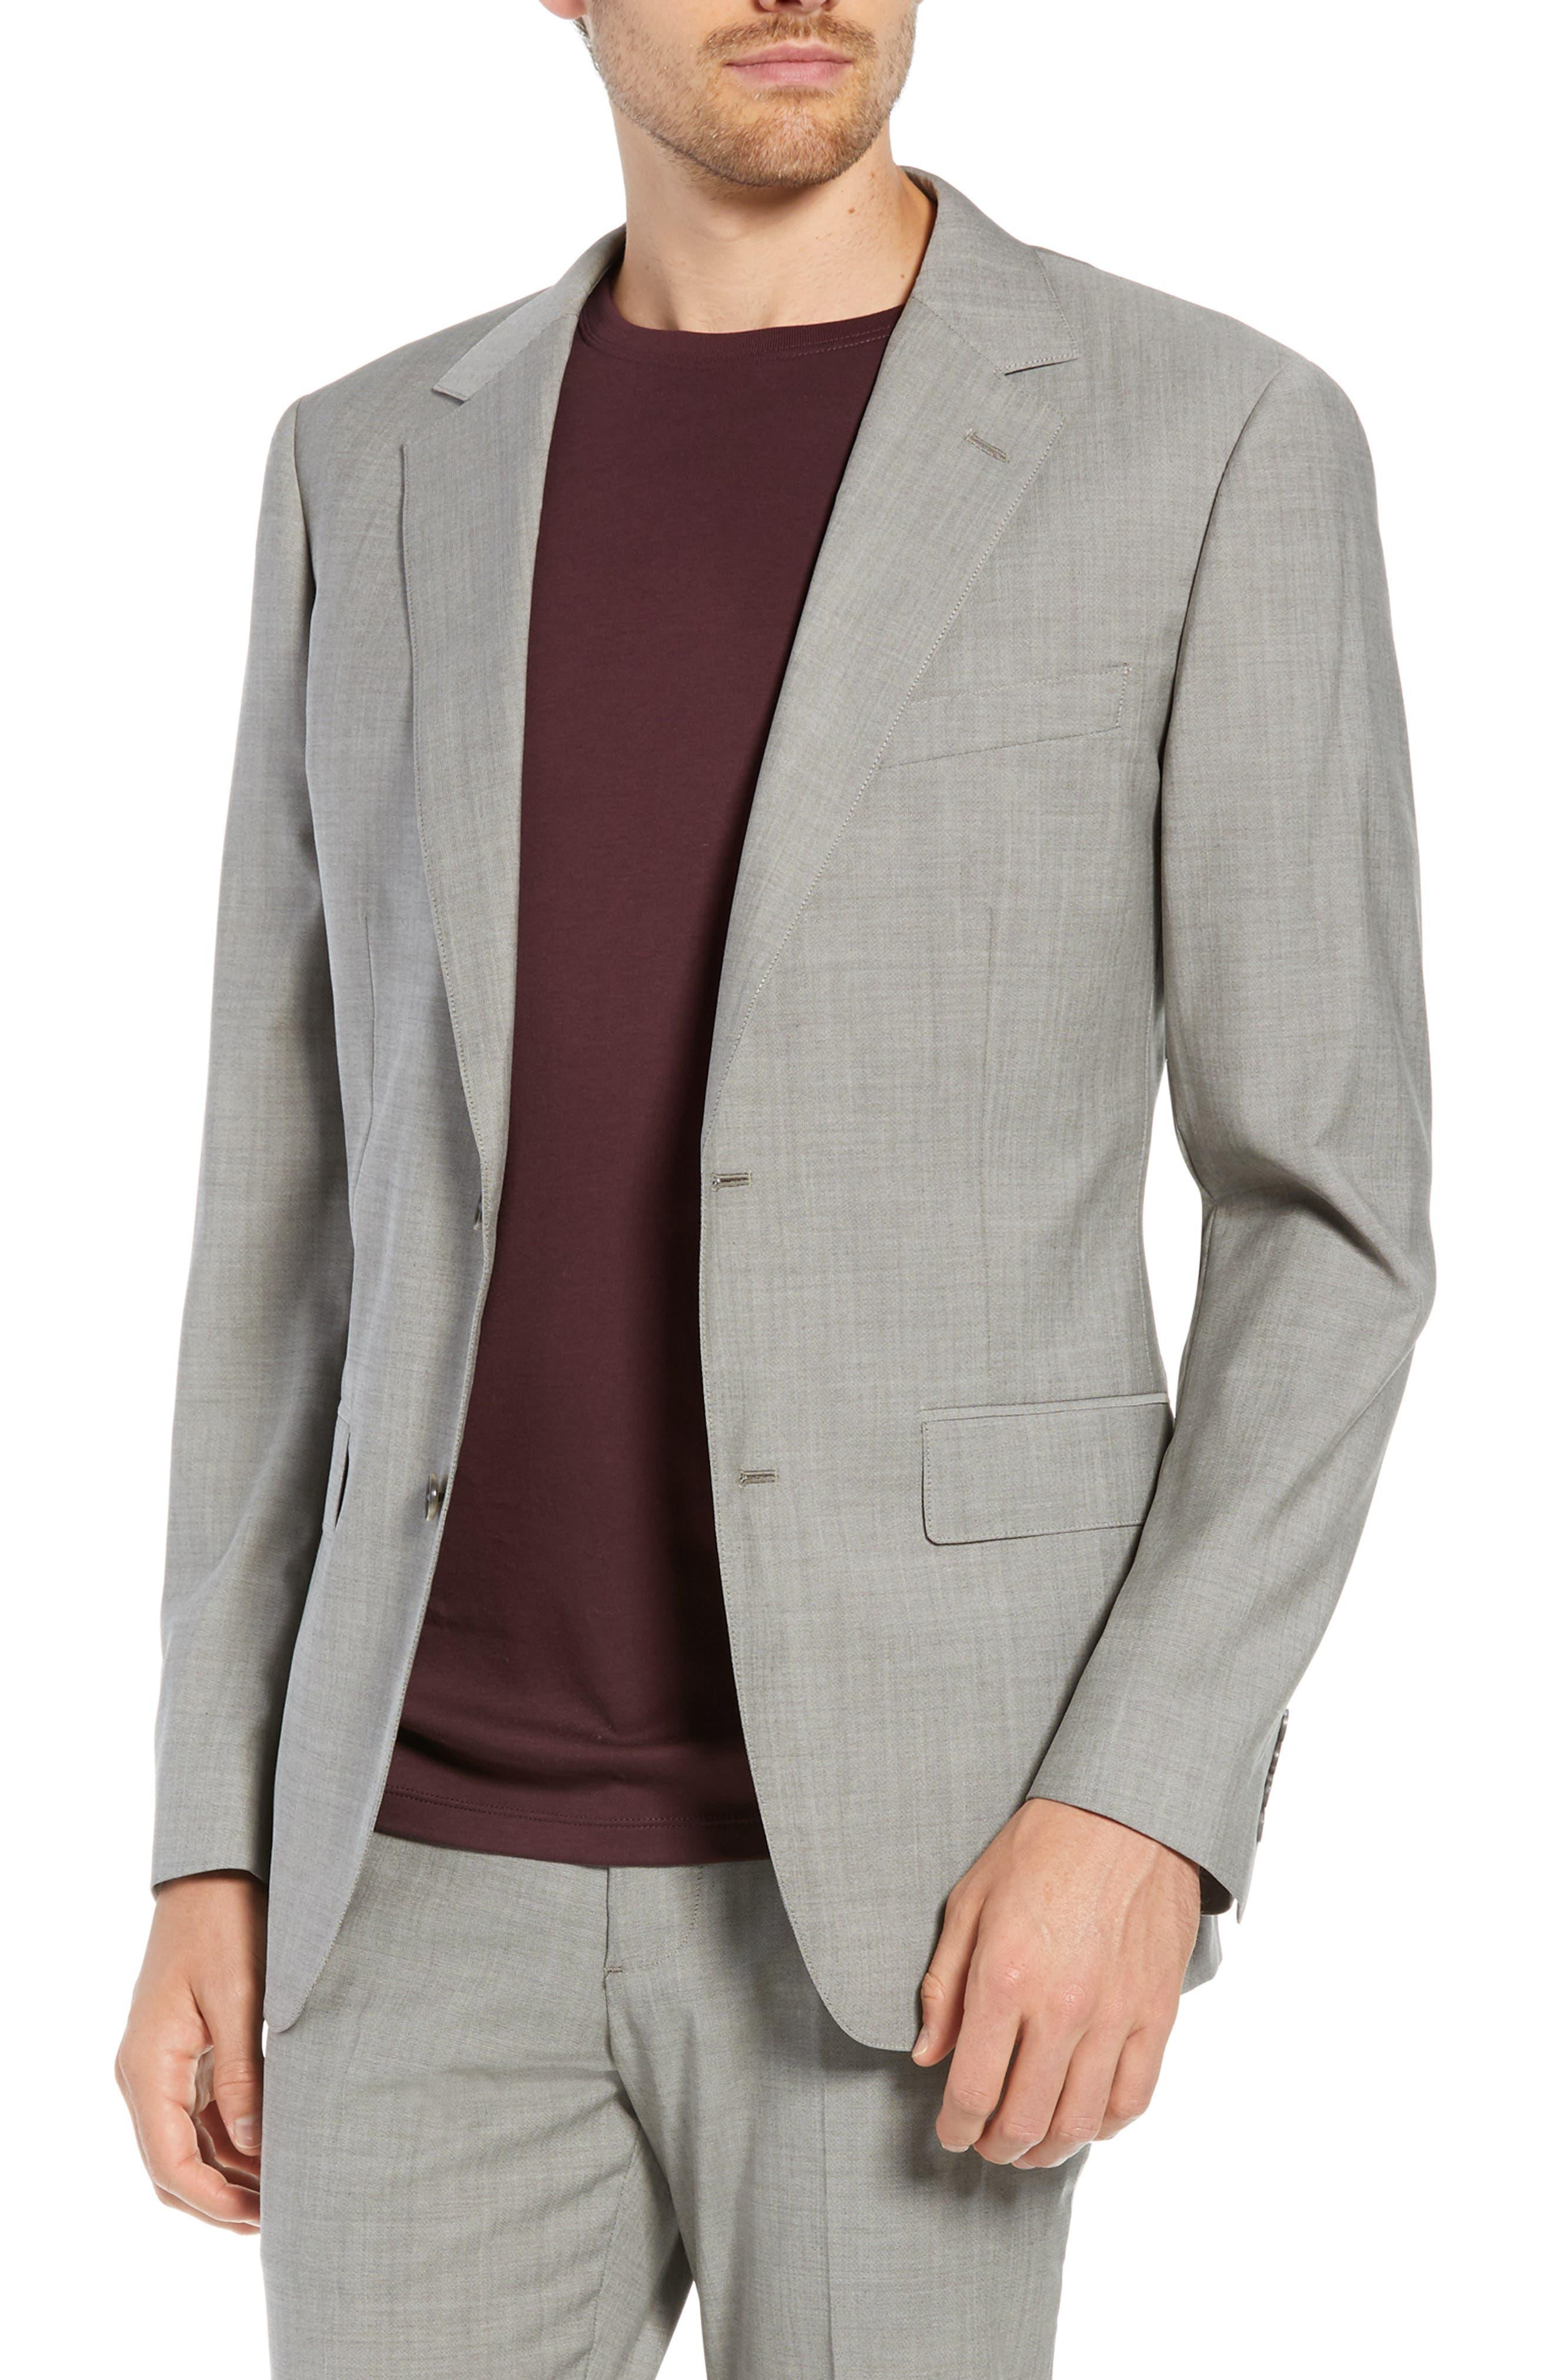 Jetsetter Slim Fit Stretch Wool Blazer,                         Main,                         color, LIGHT BROWN